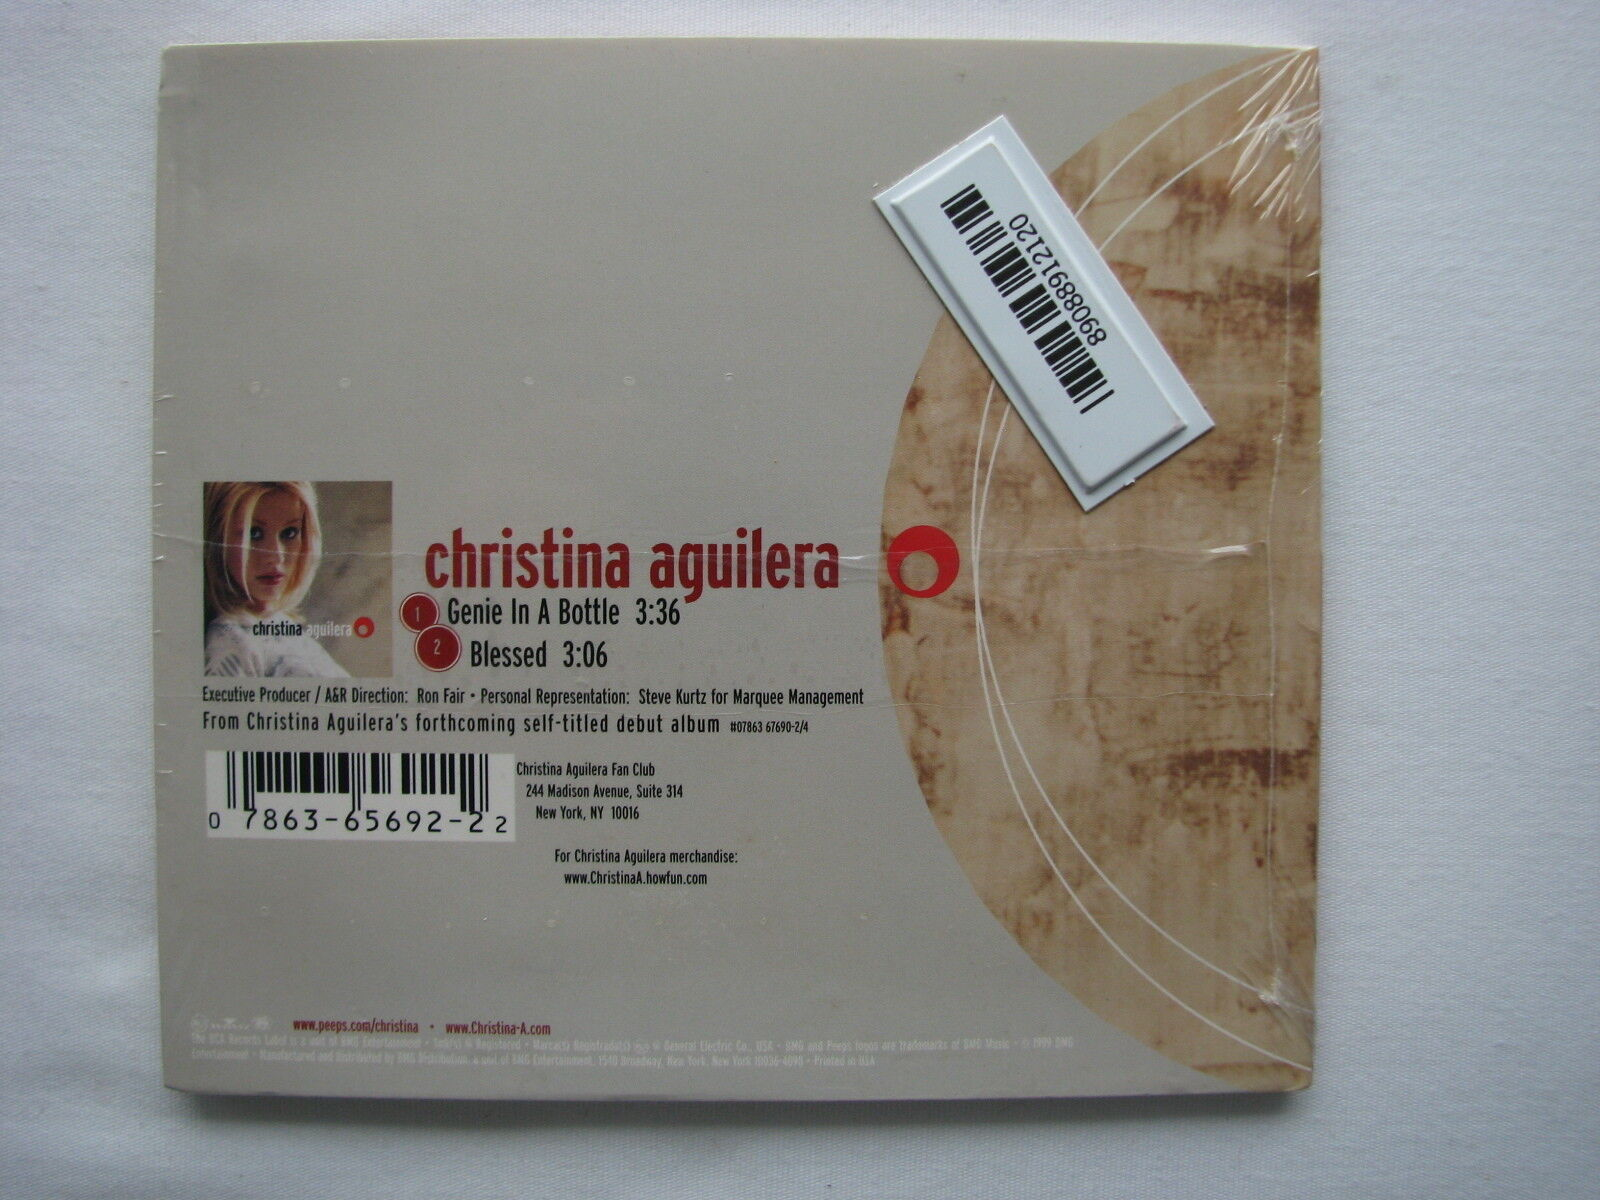 1st Single CHRISTINA AGUILERA GENIE IN A BOTTLE 2-trk. CD Single NEW/SEALED  - $27.99